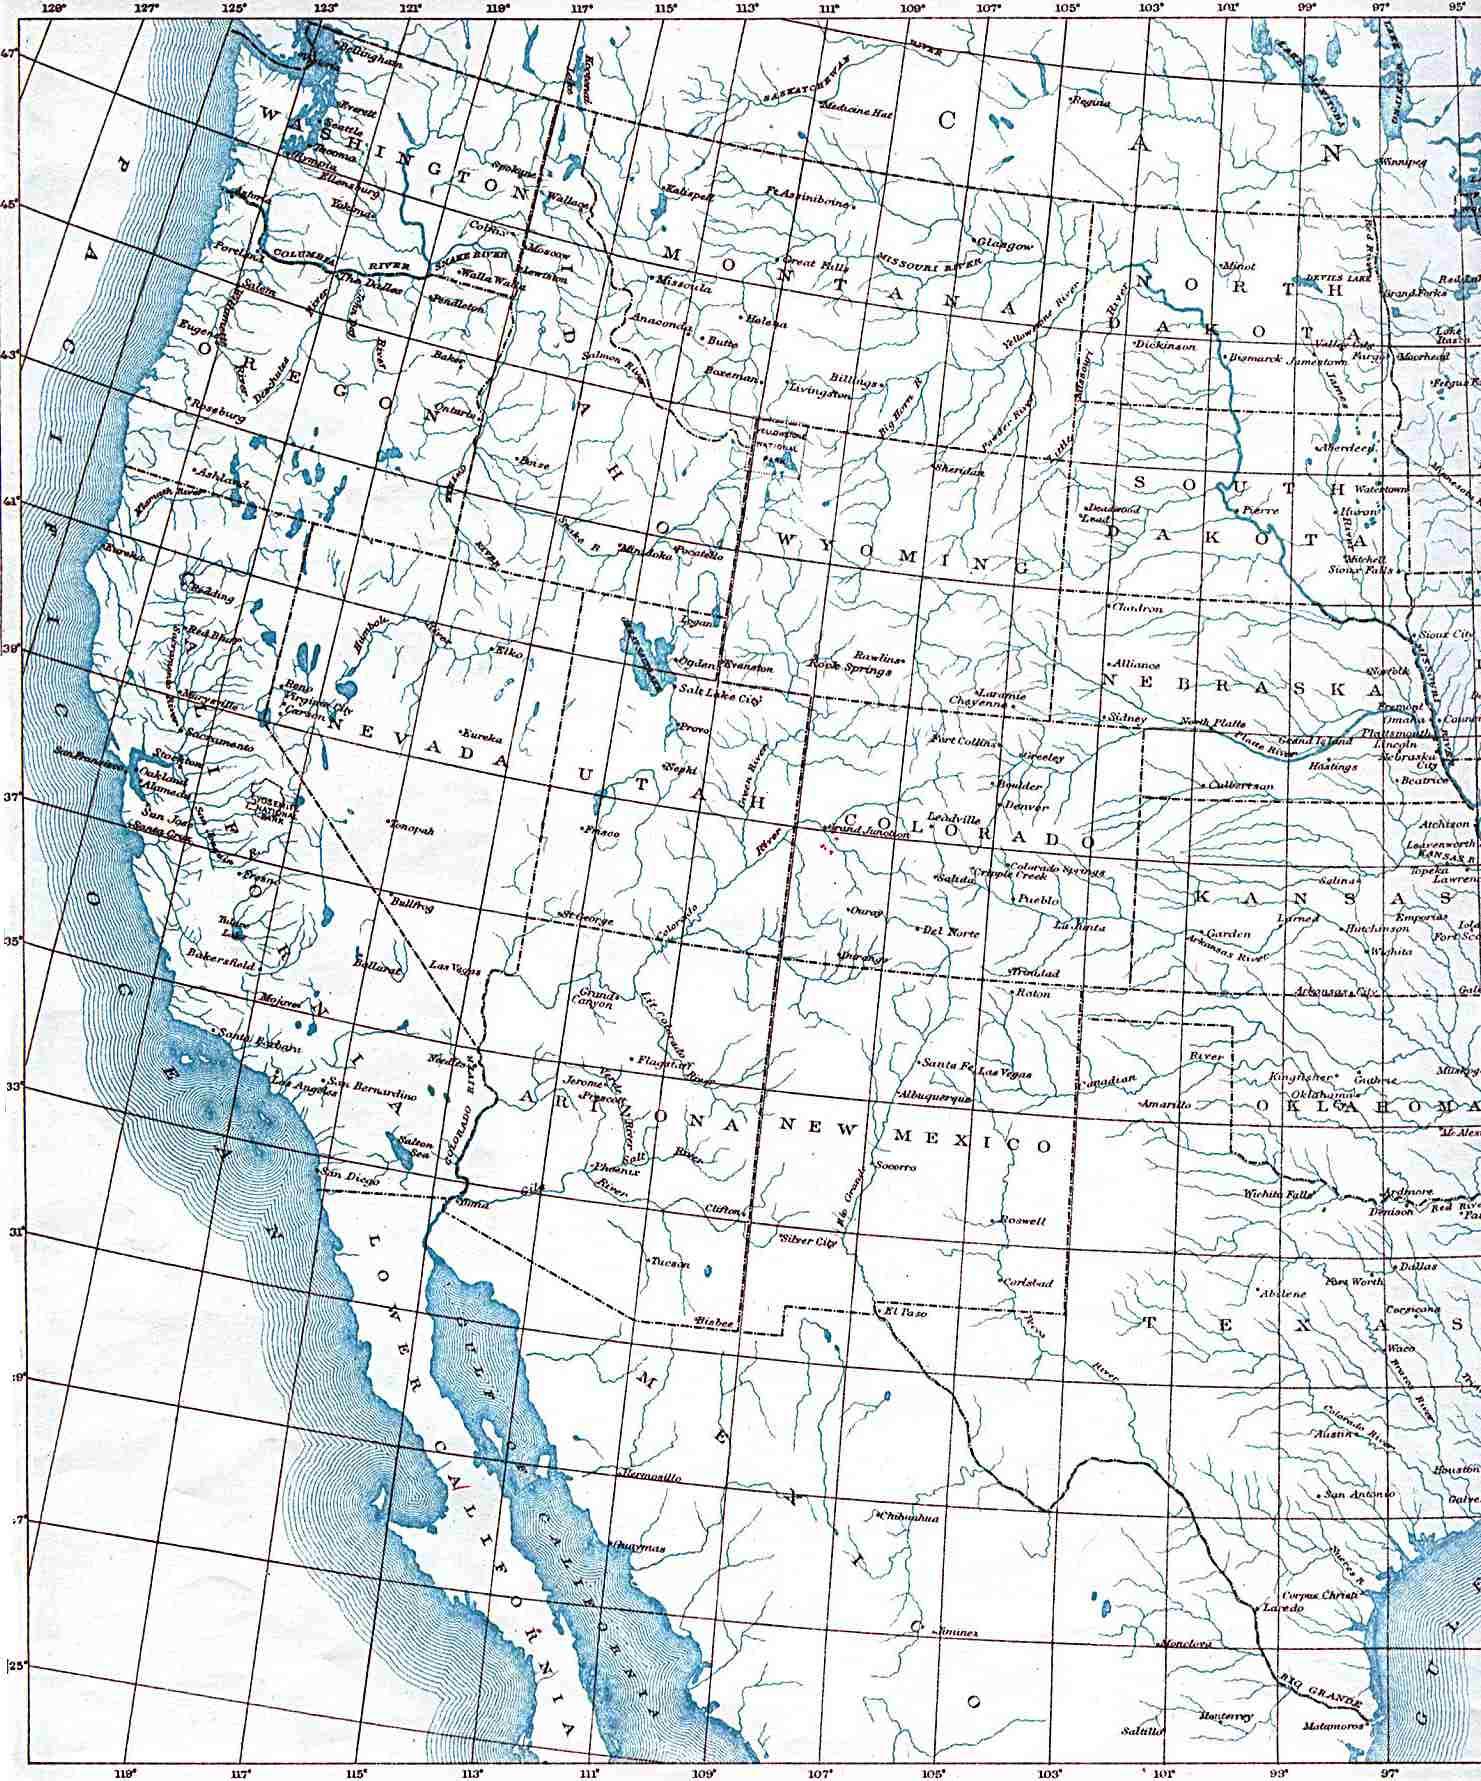 Maps of Western United States Map 1906 - mapa.owje.com